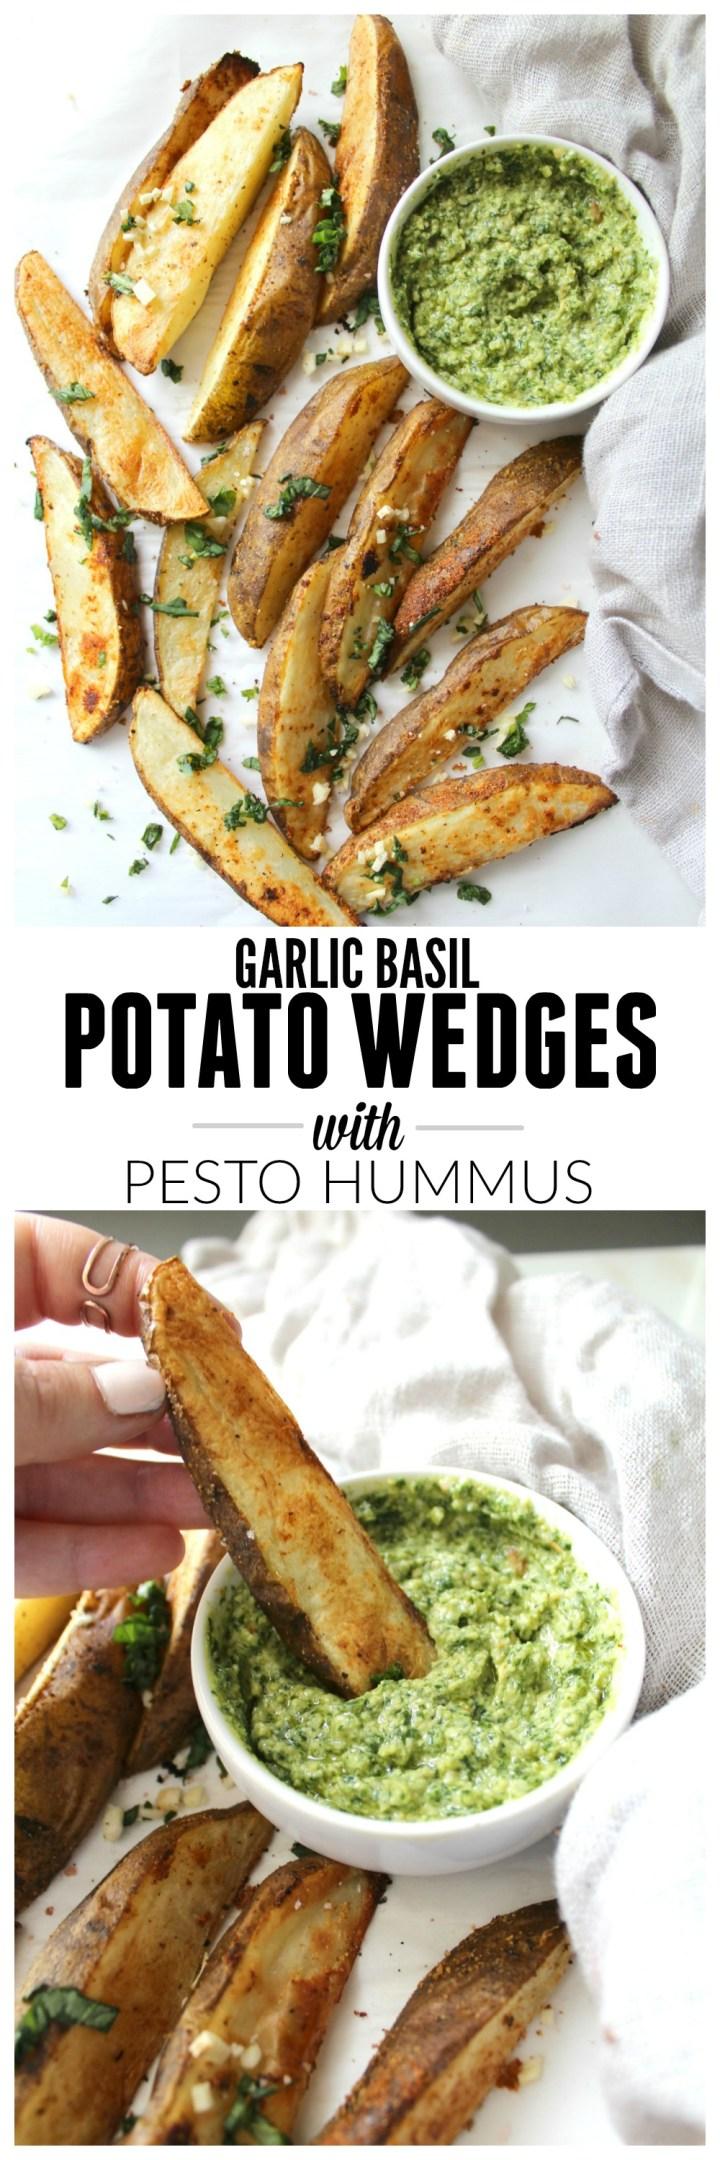 Potato Wedges with Pesto Hummus   VEGAN + GF  ThisSavoryVegan.com